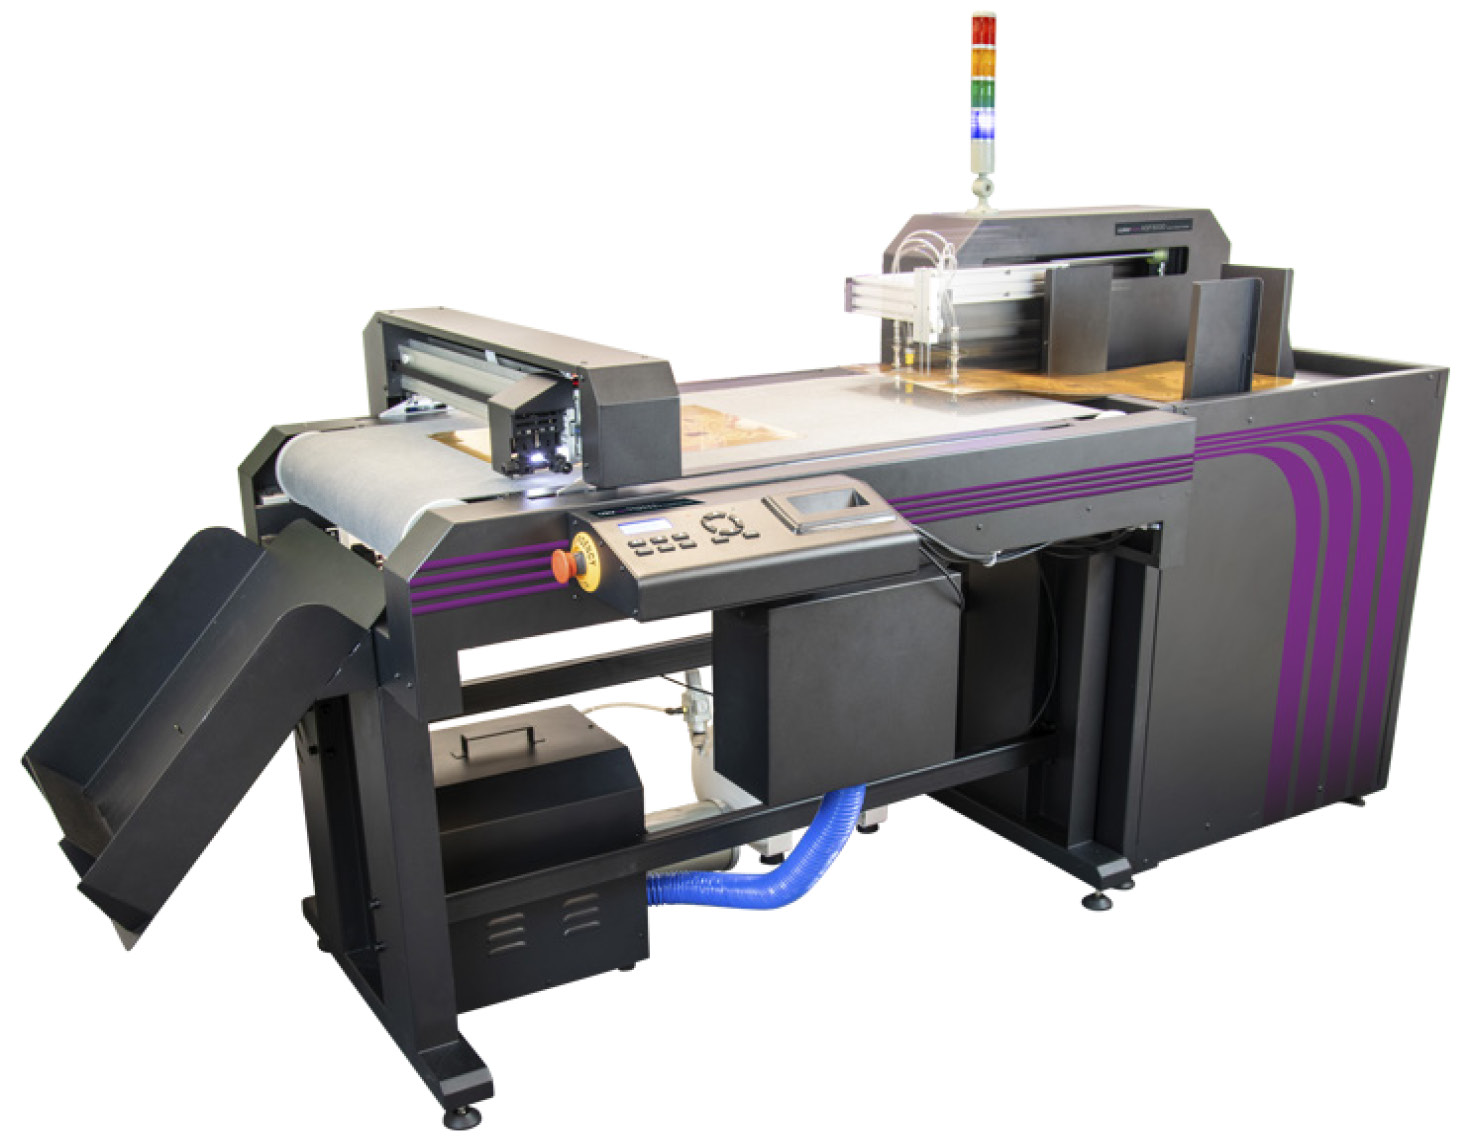 Cutting and creasing machine